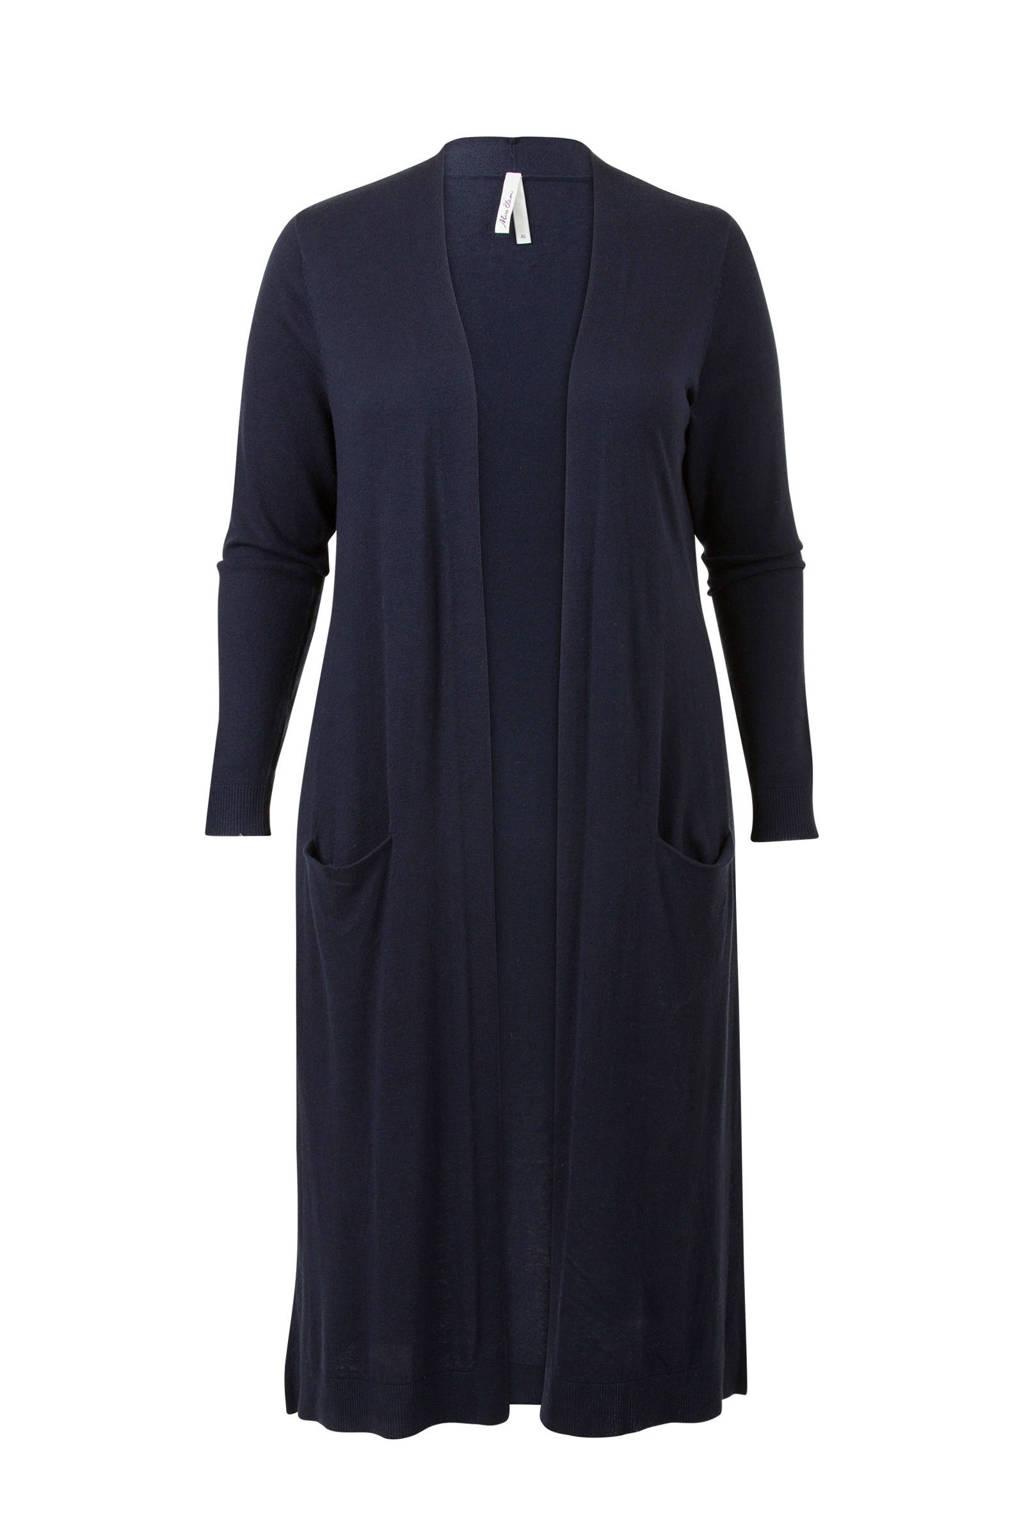 Miss Etam Plus lang vest donkerblauw, Donkerblauw